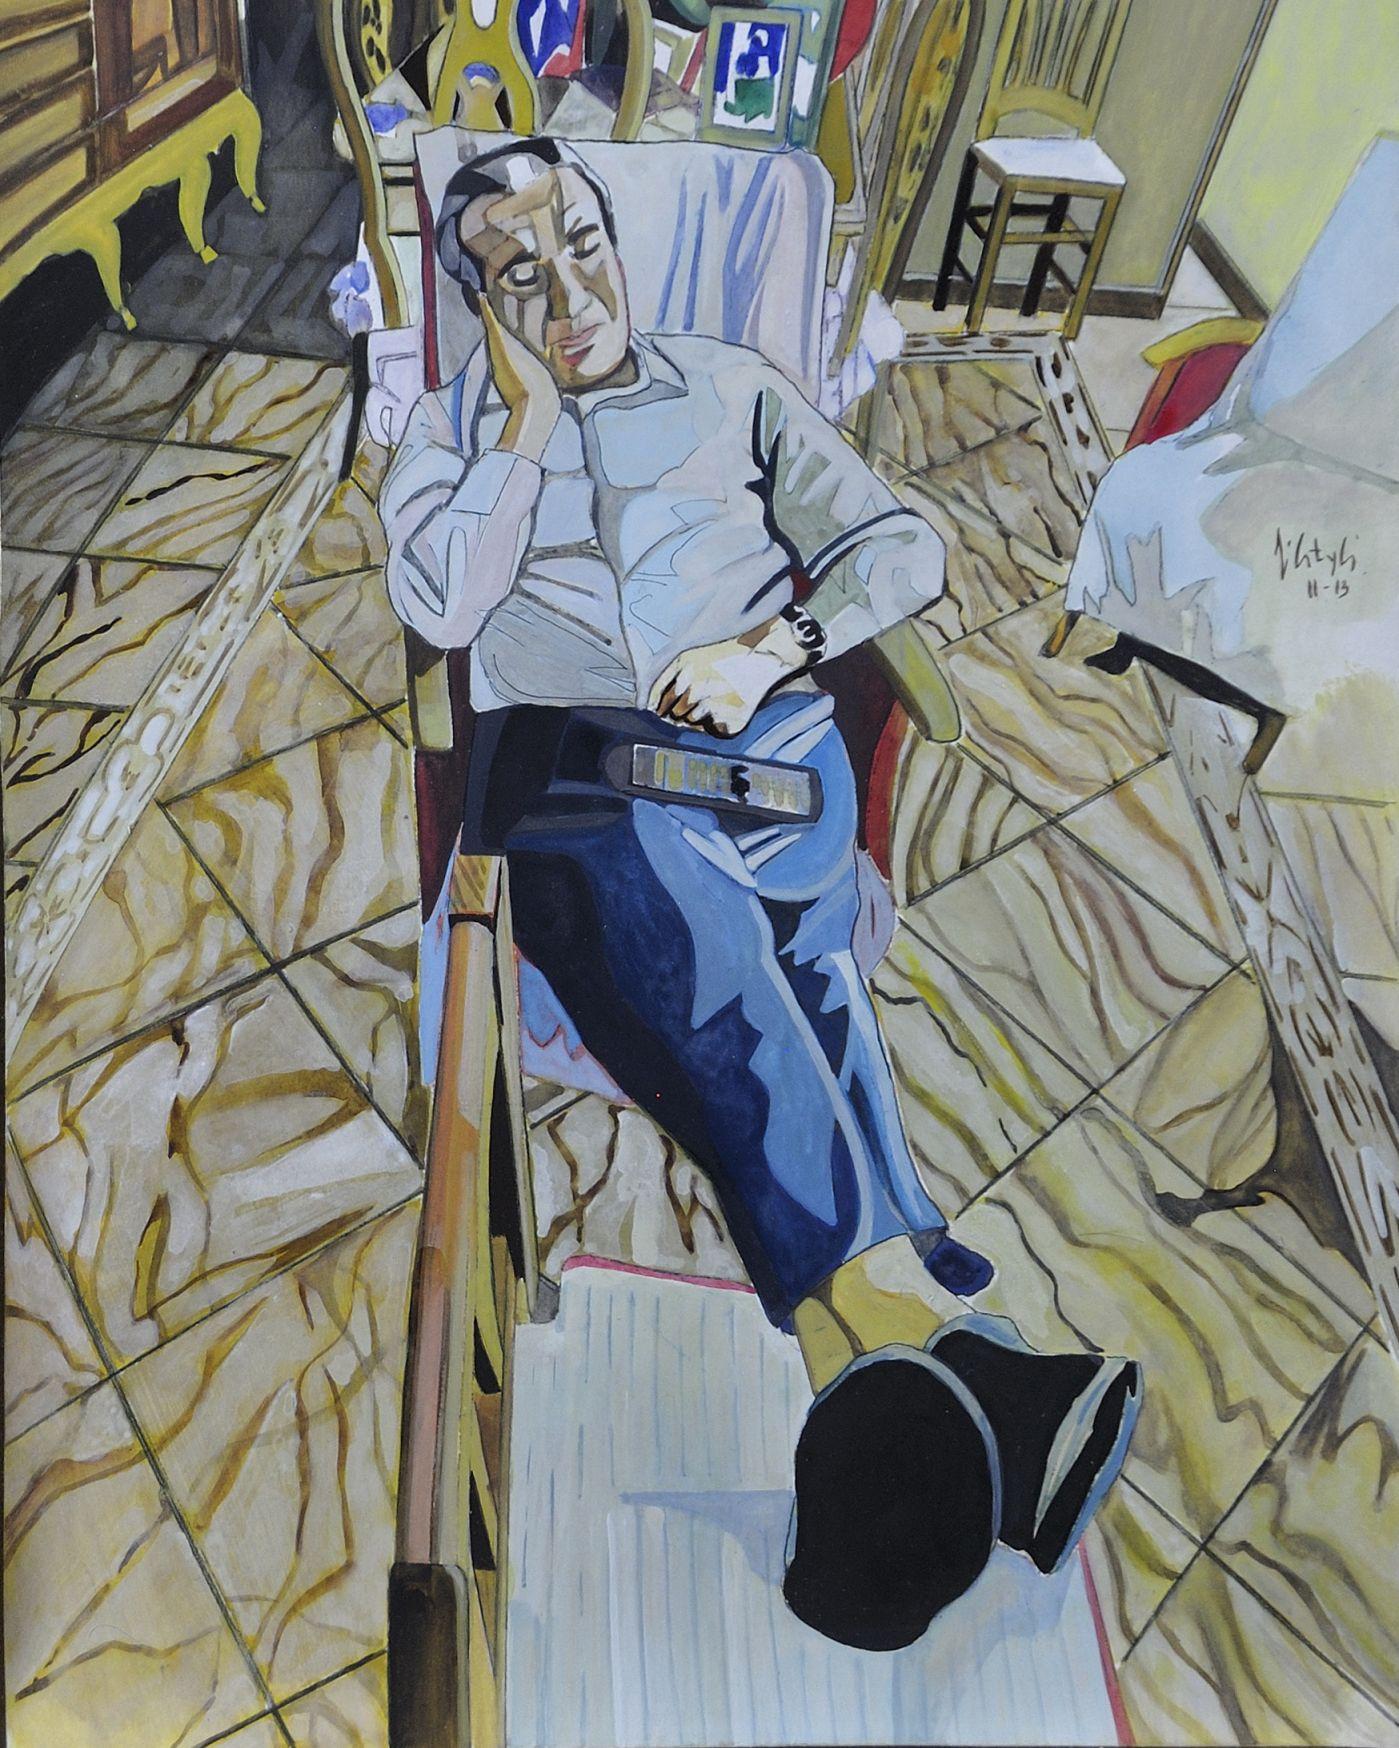 Personaje sentado (2012) - Pepe Carretero